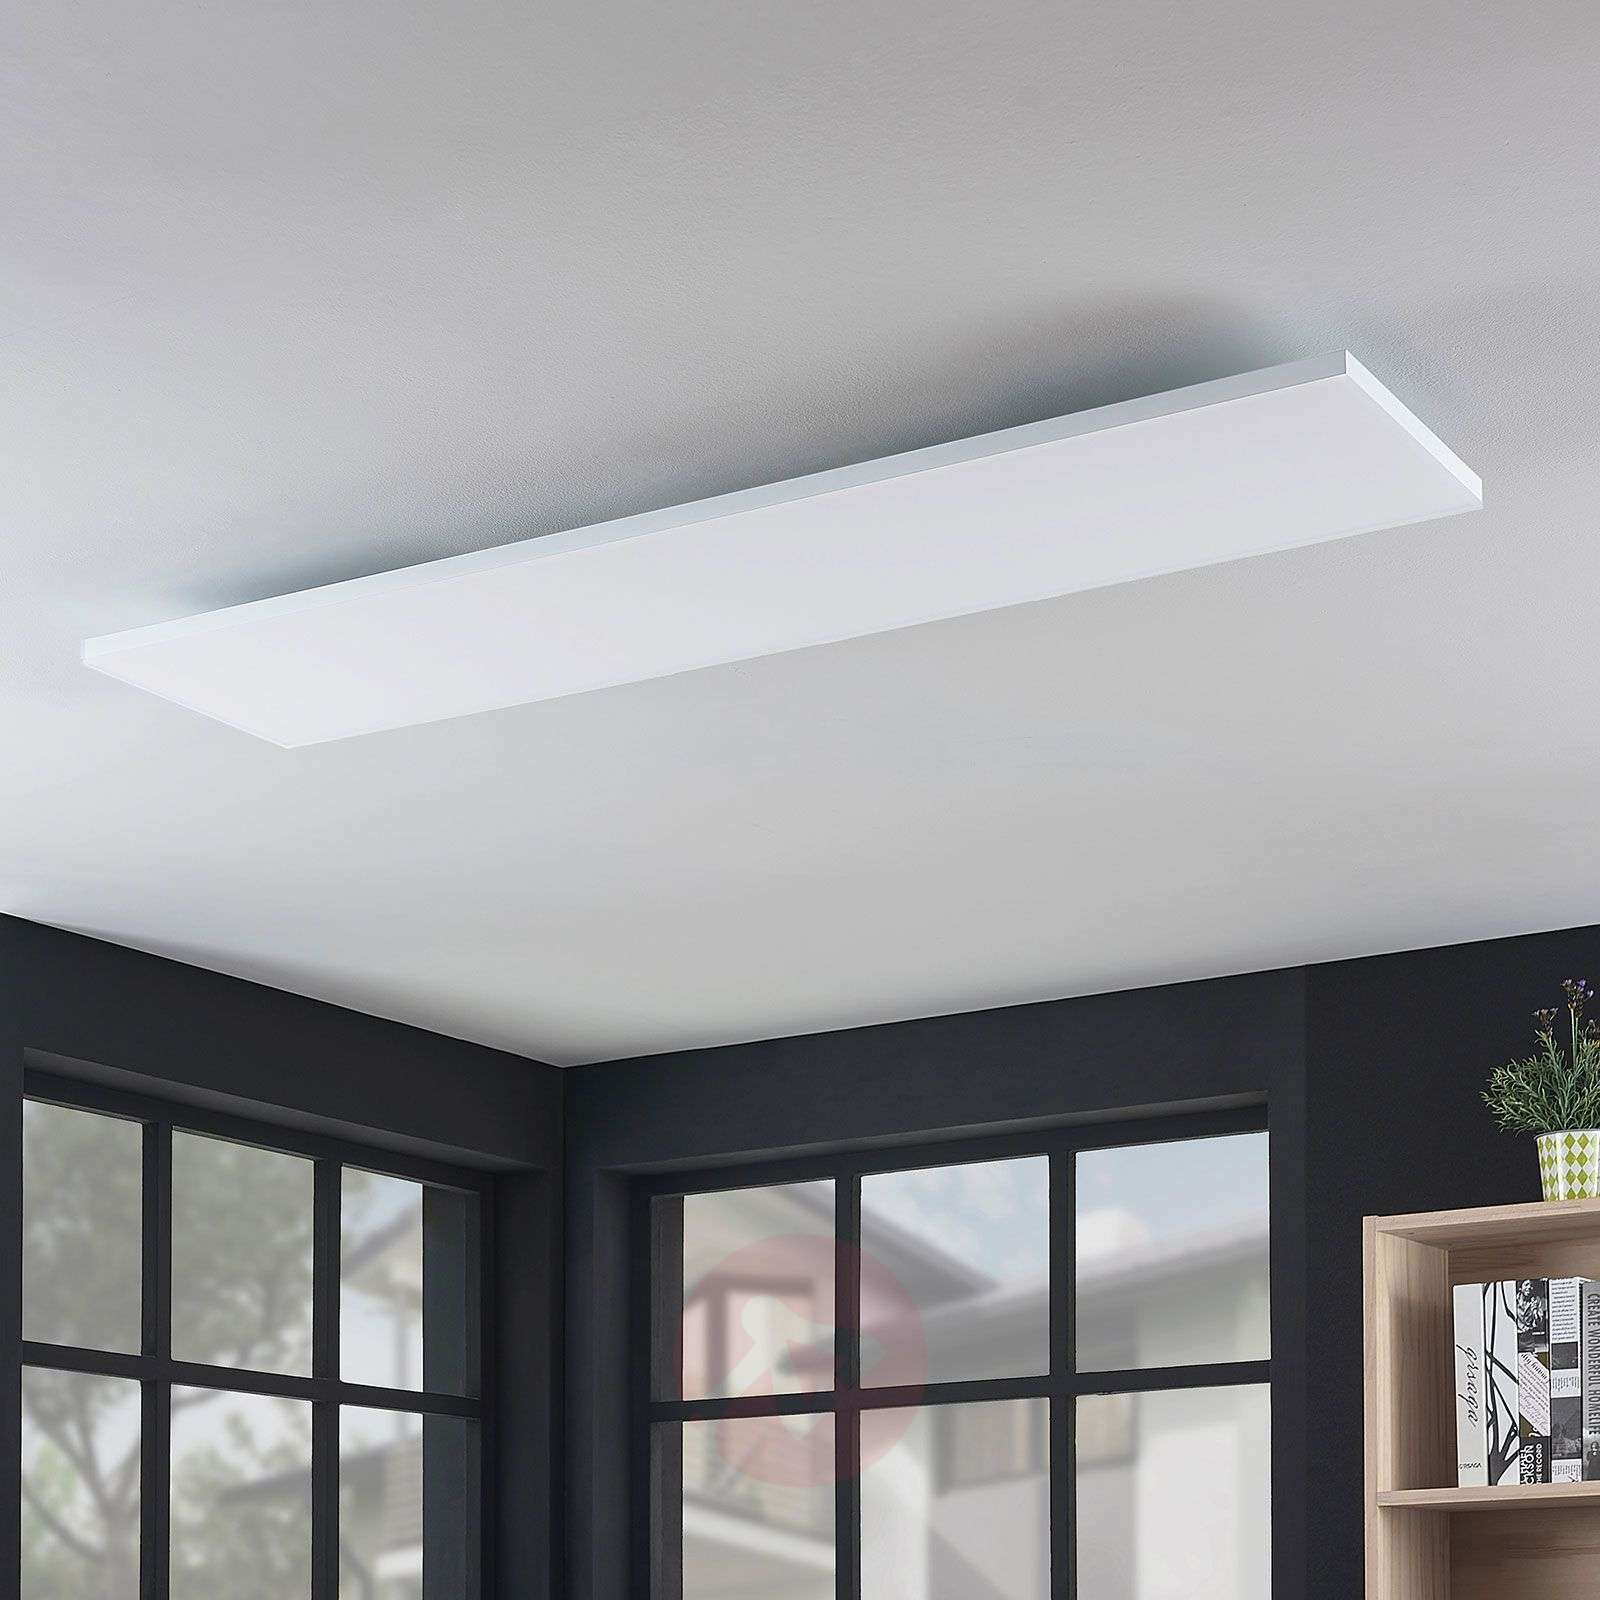 Blaan CCT LED panel with remote, 119.5 x 29.5 cm-9624331-01